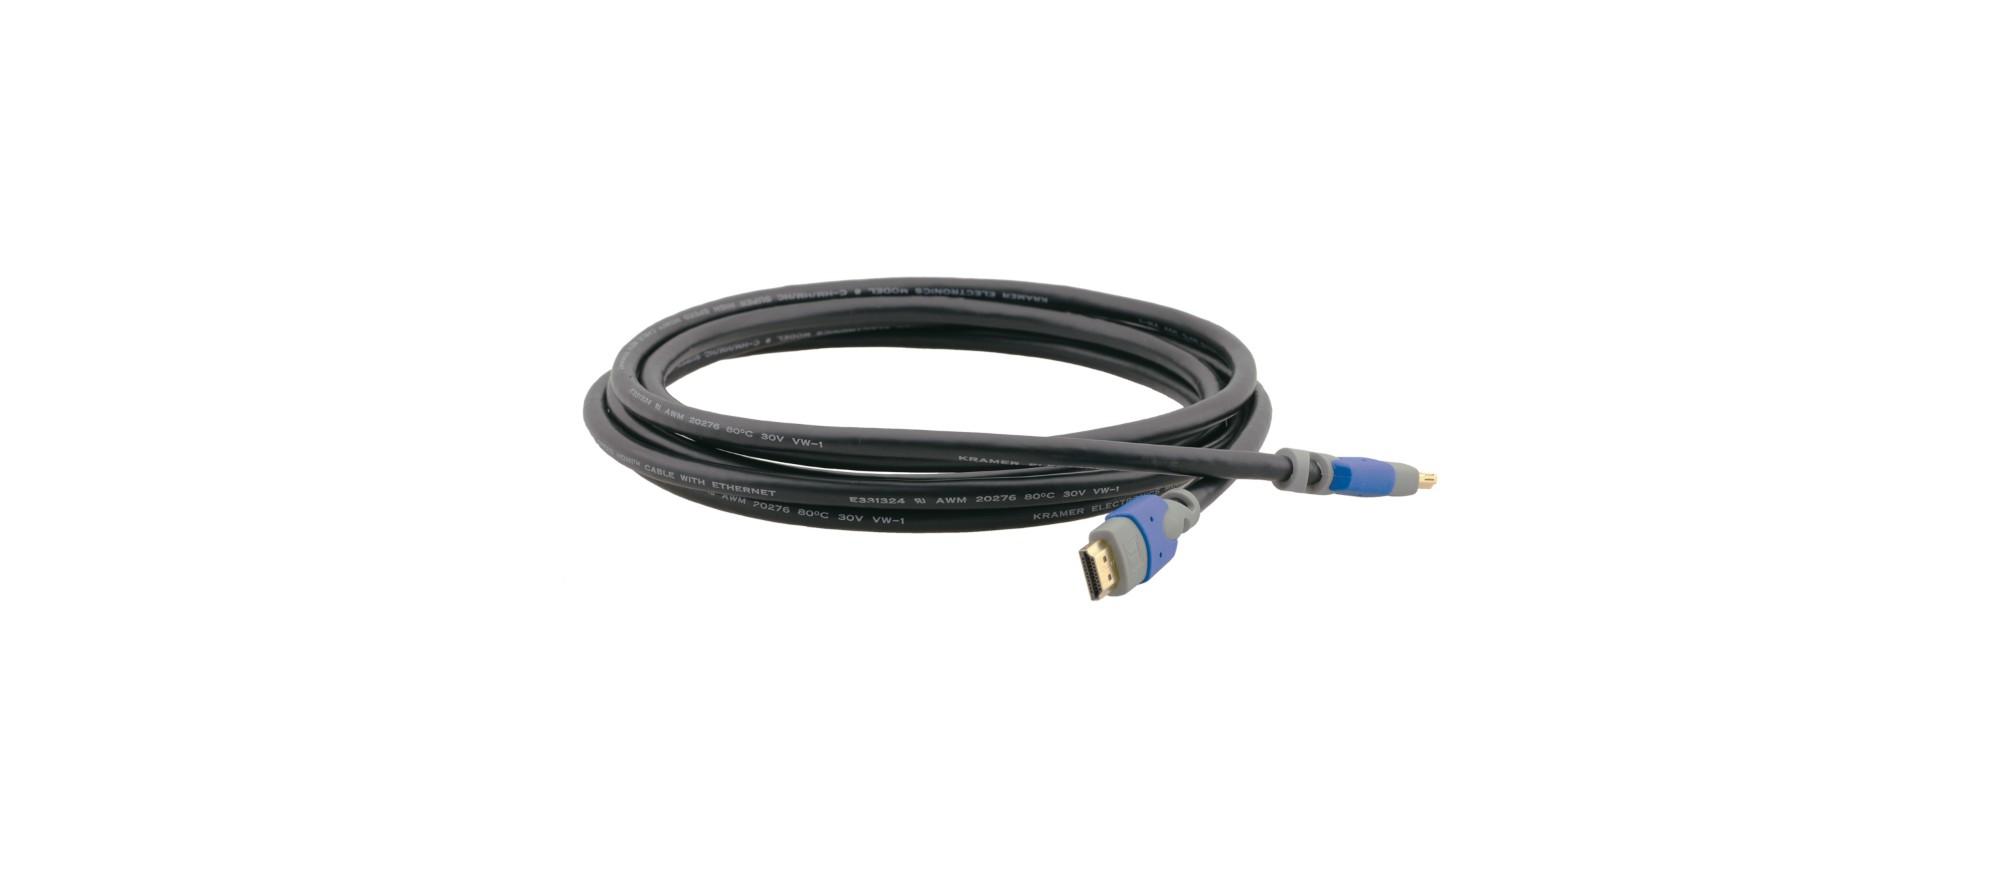 Kramer Electronics C-HM/HM/PRO-3 cable HDMI 0,9 m HDMI tipo A (Estándar) Negro